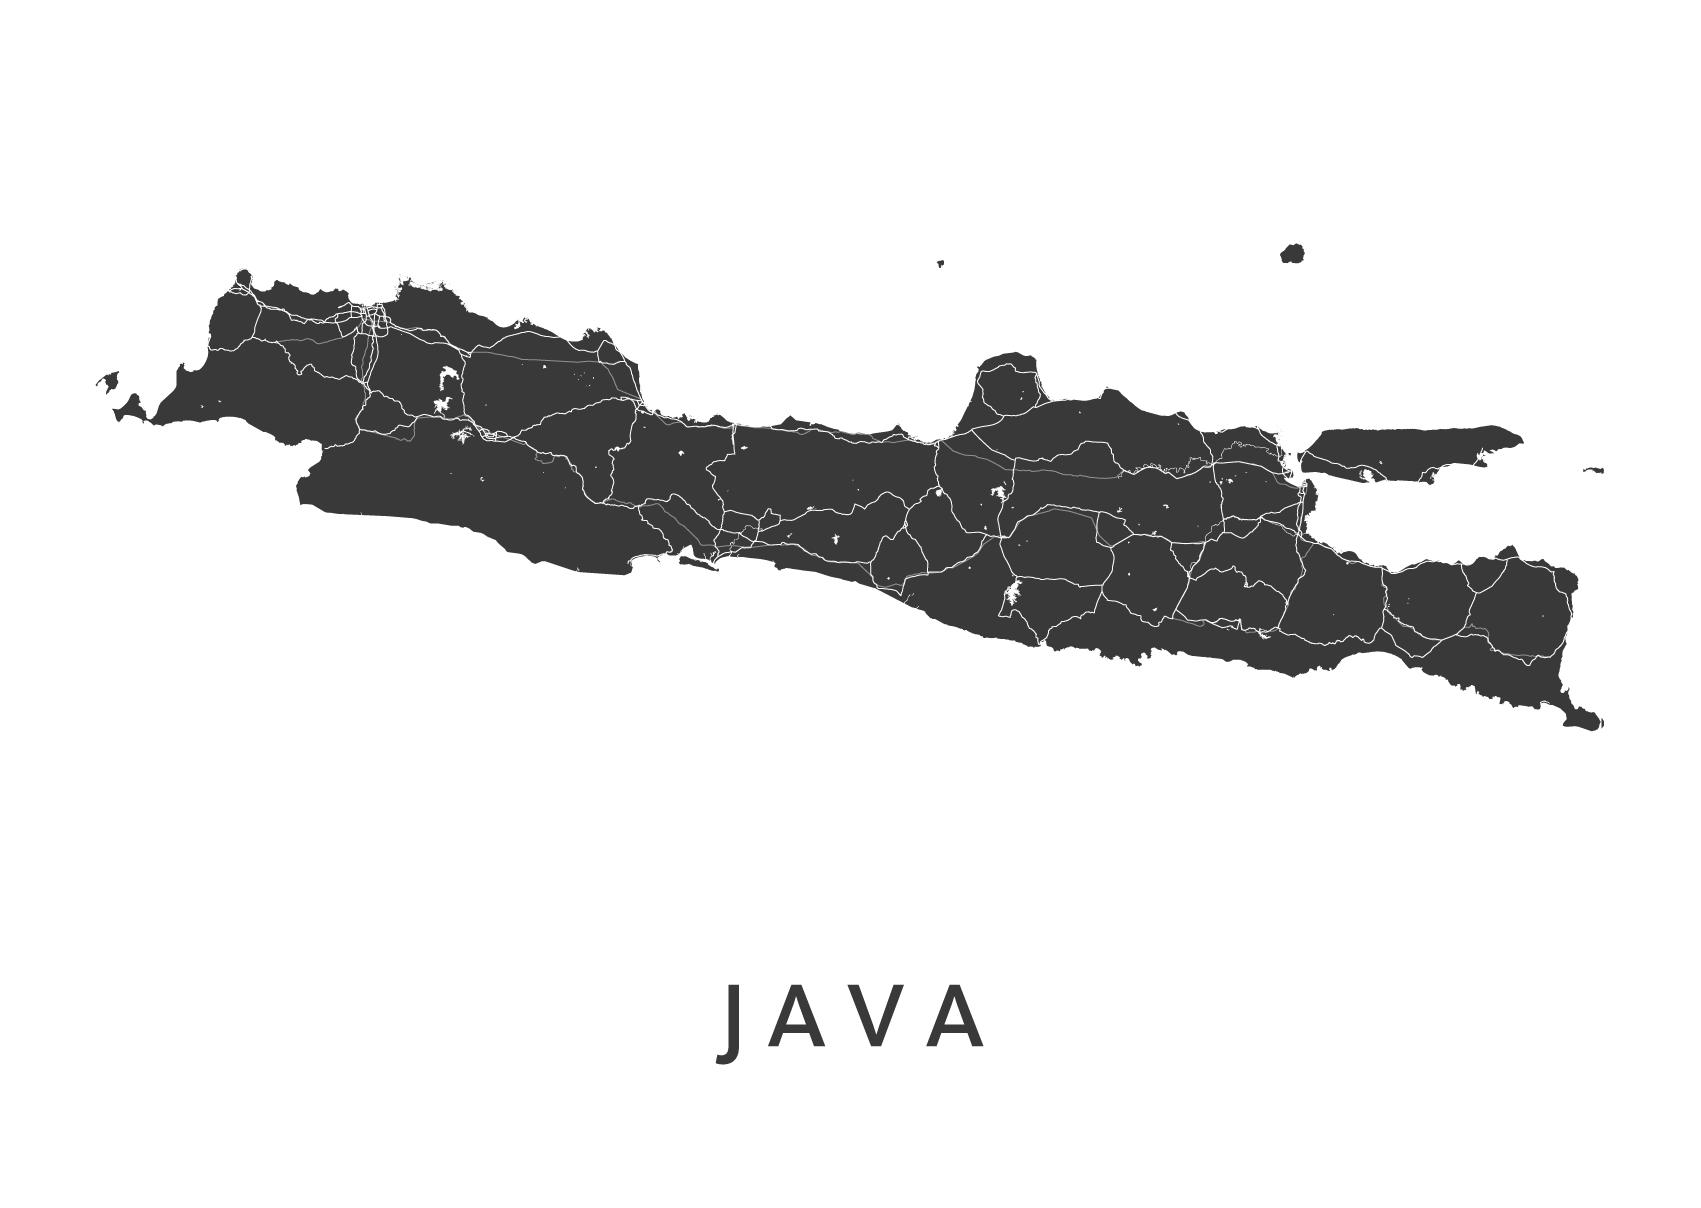 Java White Island Map